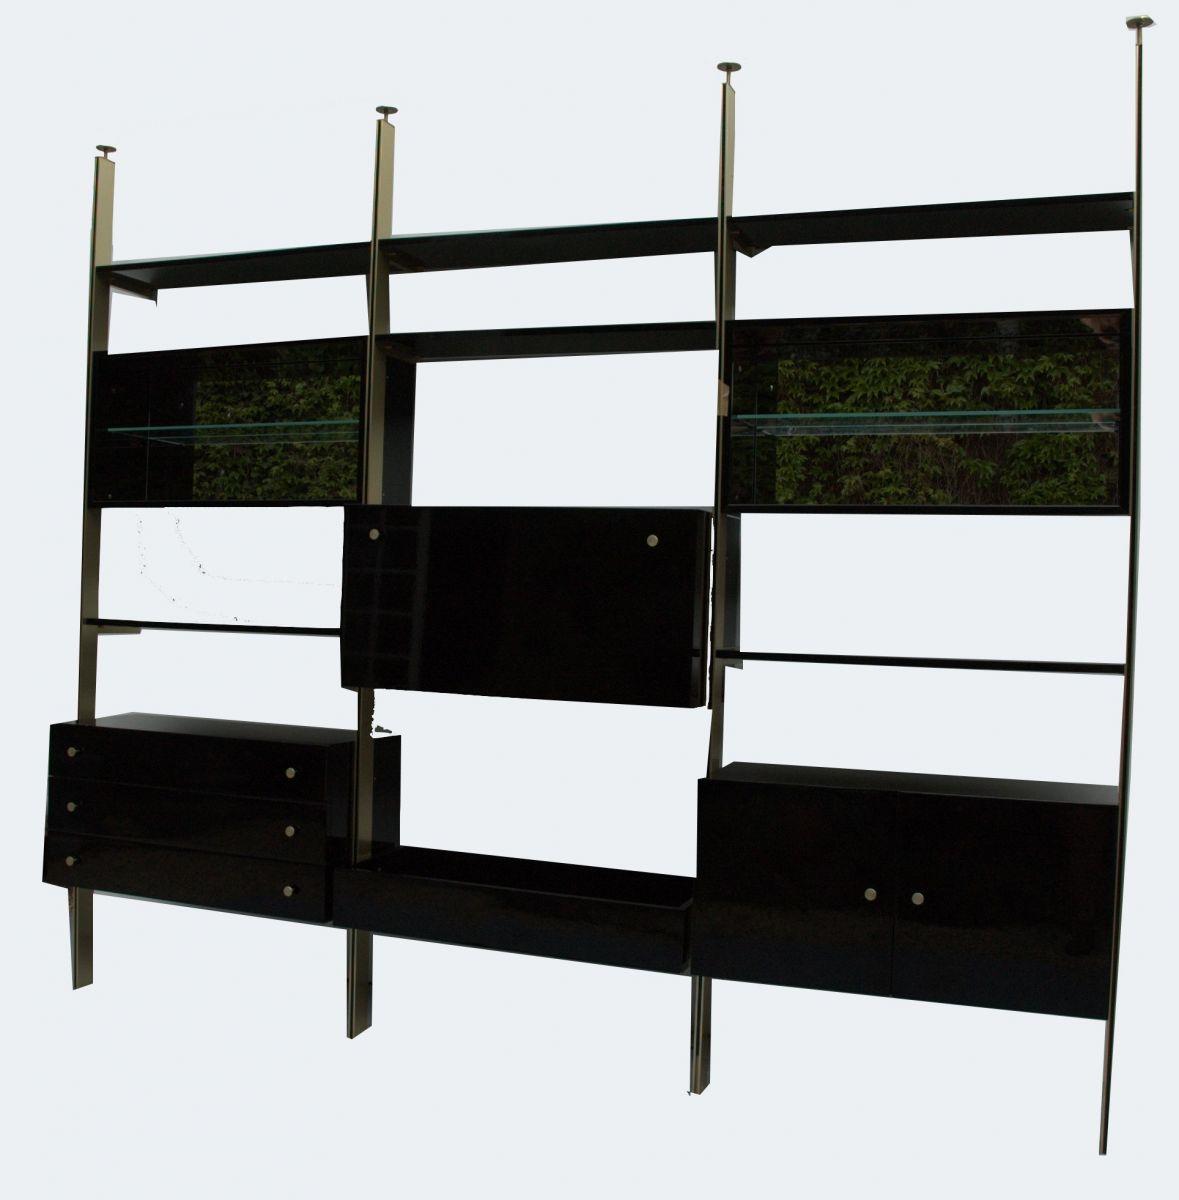 biblioth que tag res en laque et laiton roche bobois 1970s luckyfind. Black Bedroom Furniture Sets. Home Design Ideas